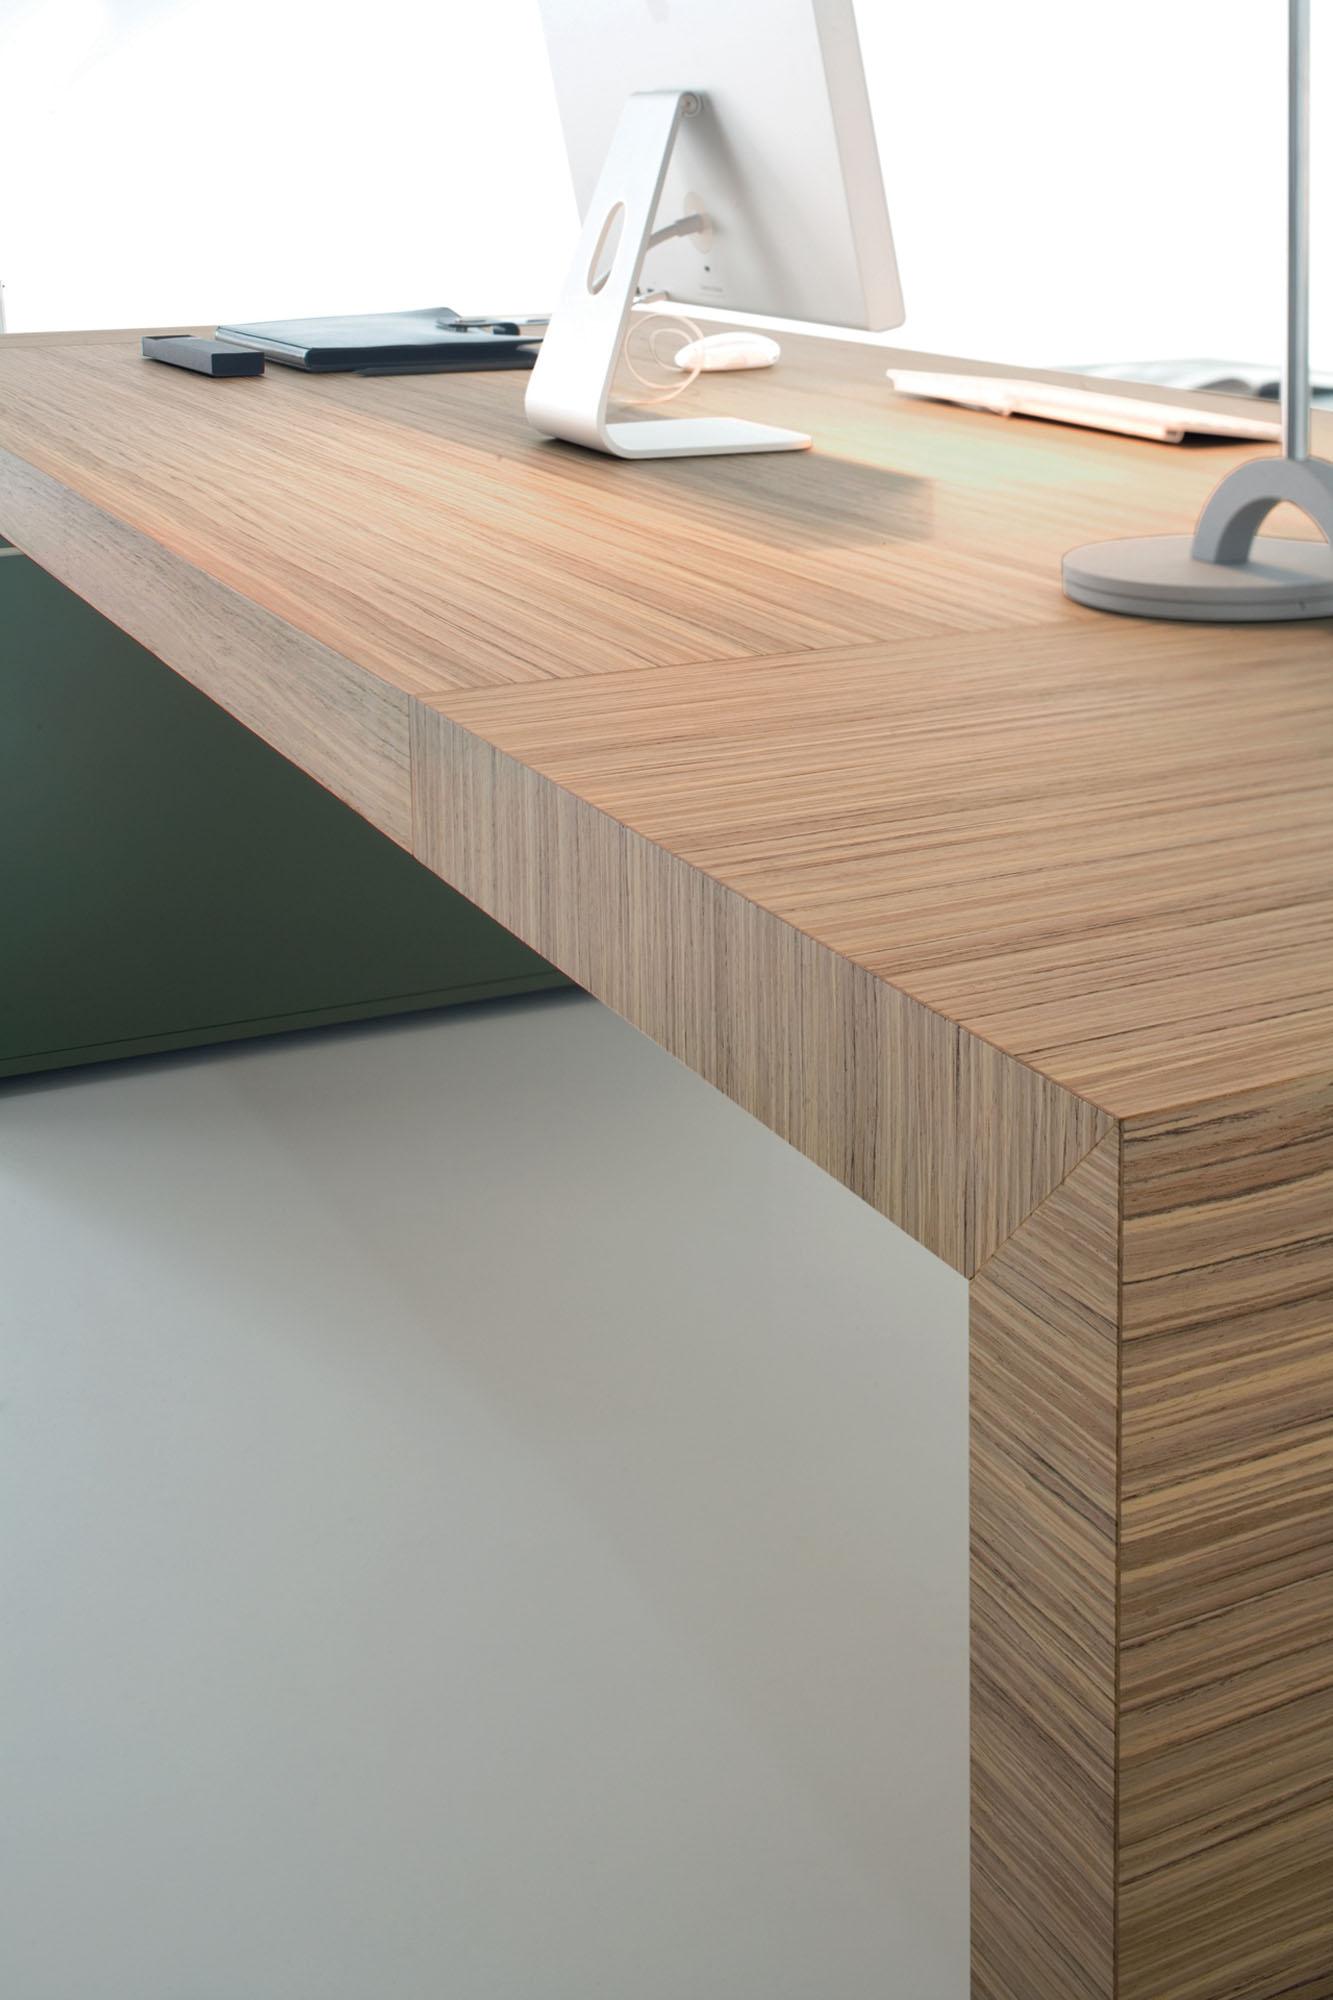 bureau bois naturel gallery of bureau moderne with bureau bois naturel petit de bureau en bois. Black Bedroom Furniture Sets. Home Design Ideas